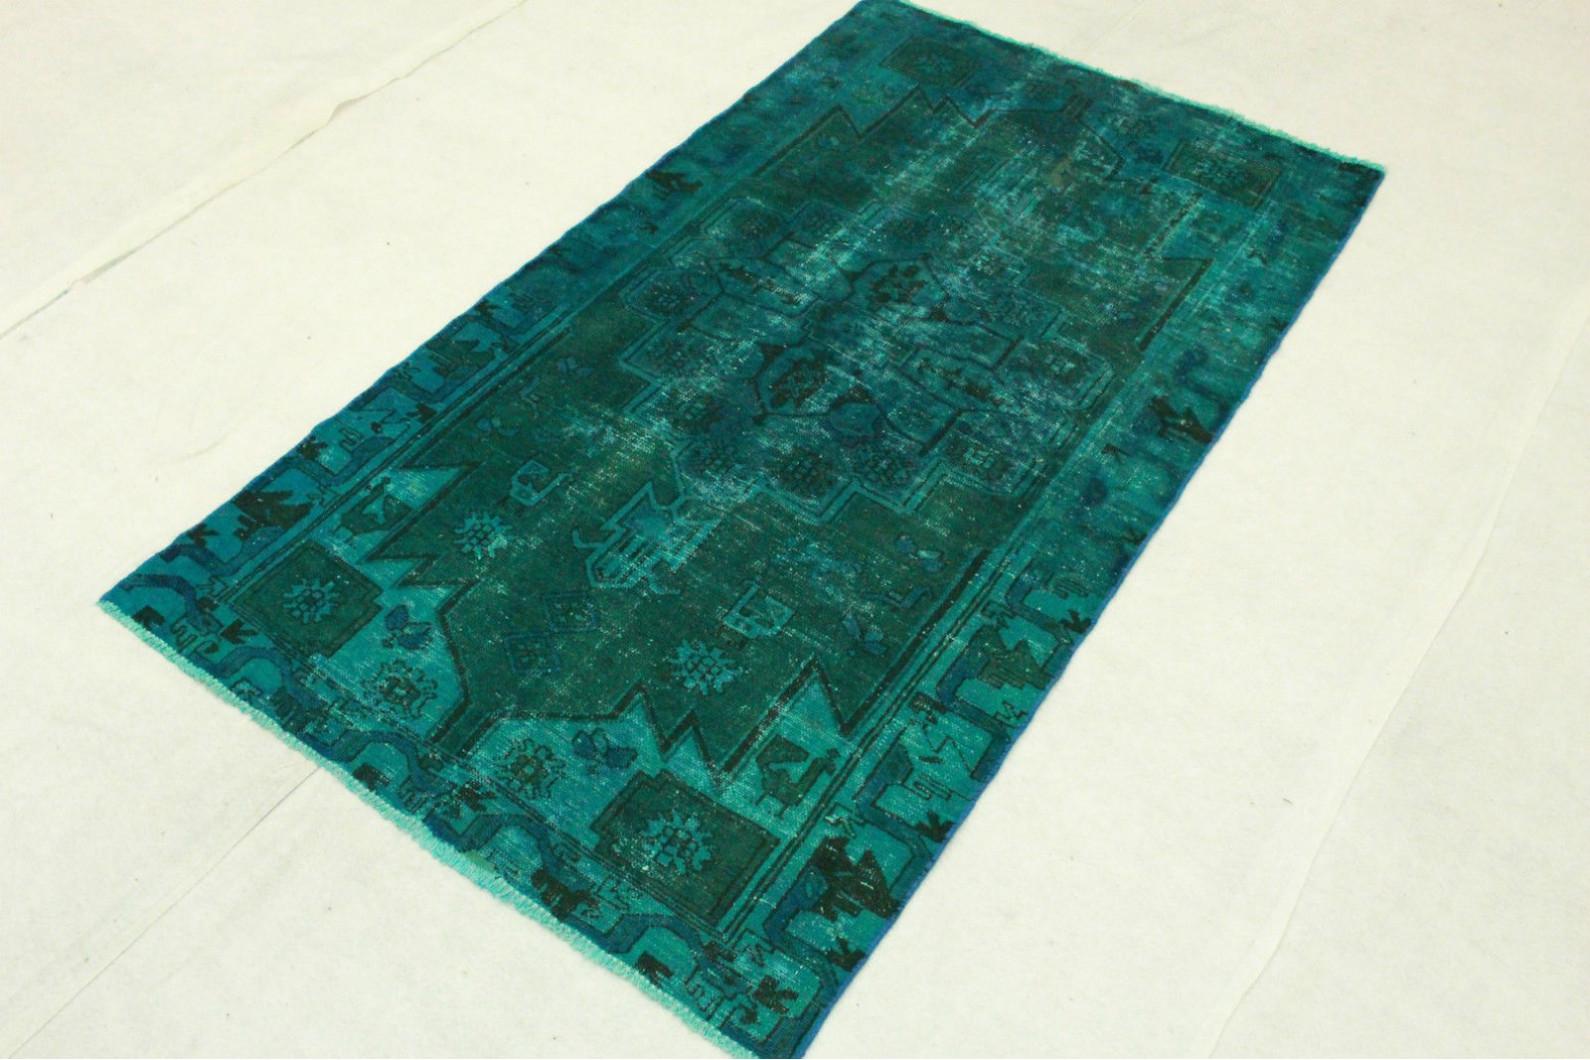 vintage teppich blau t rkis in 200x110cm 1001 3281 bei. Black Bedroom Furniture Sets. Home Design Ideas